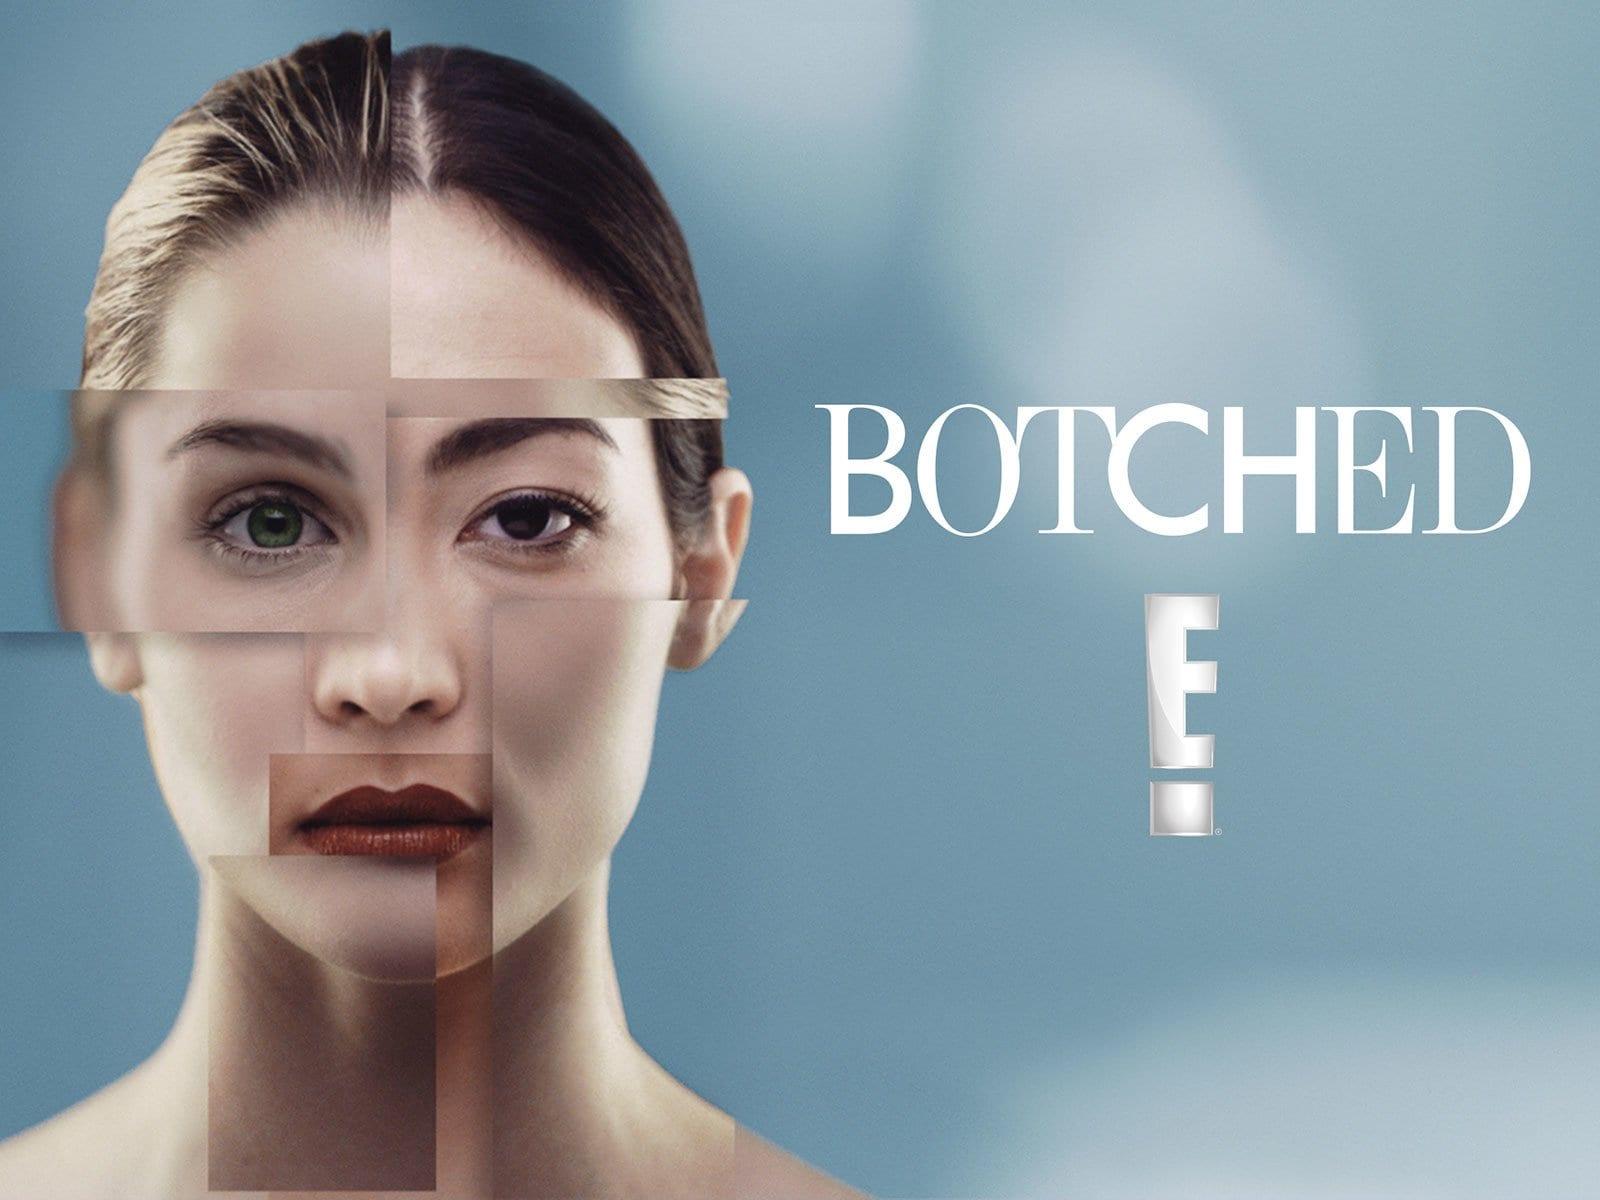 Botched season 7